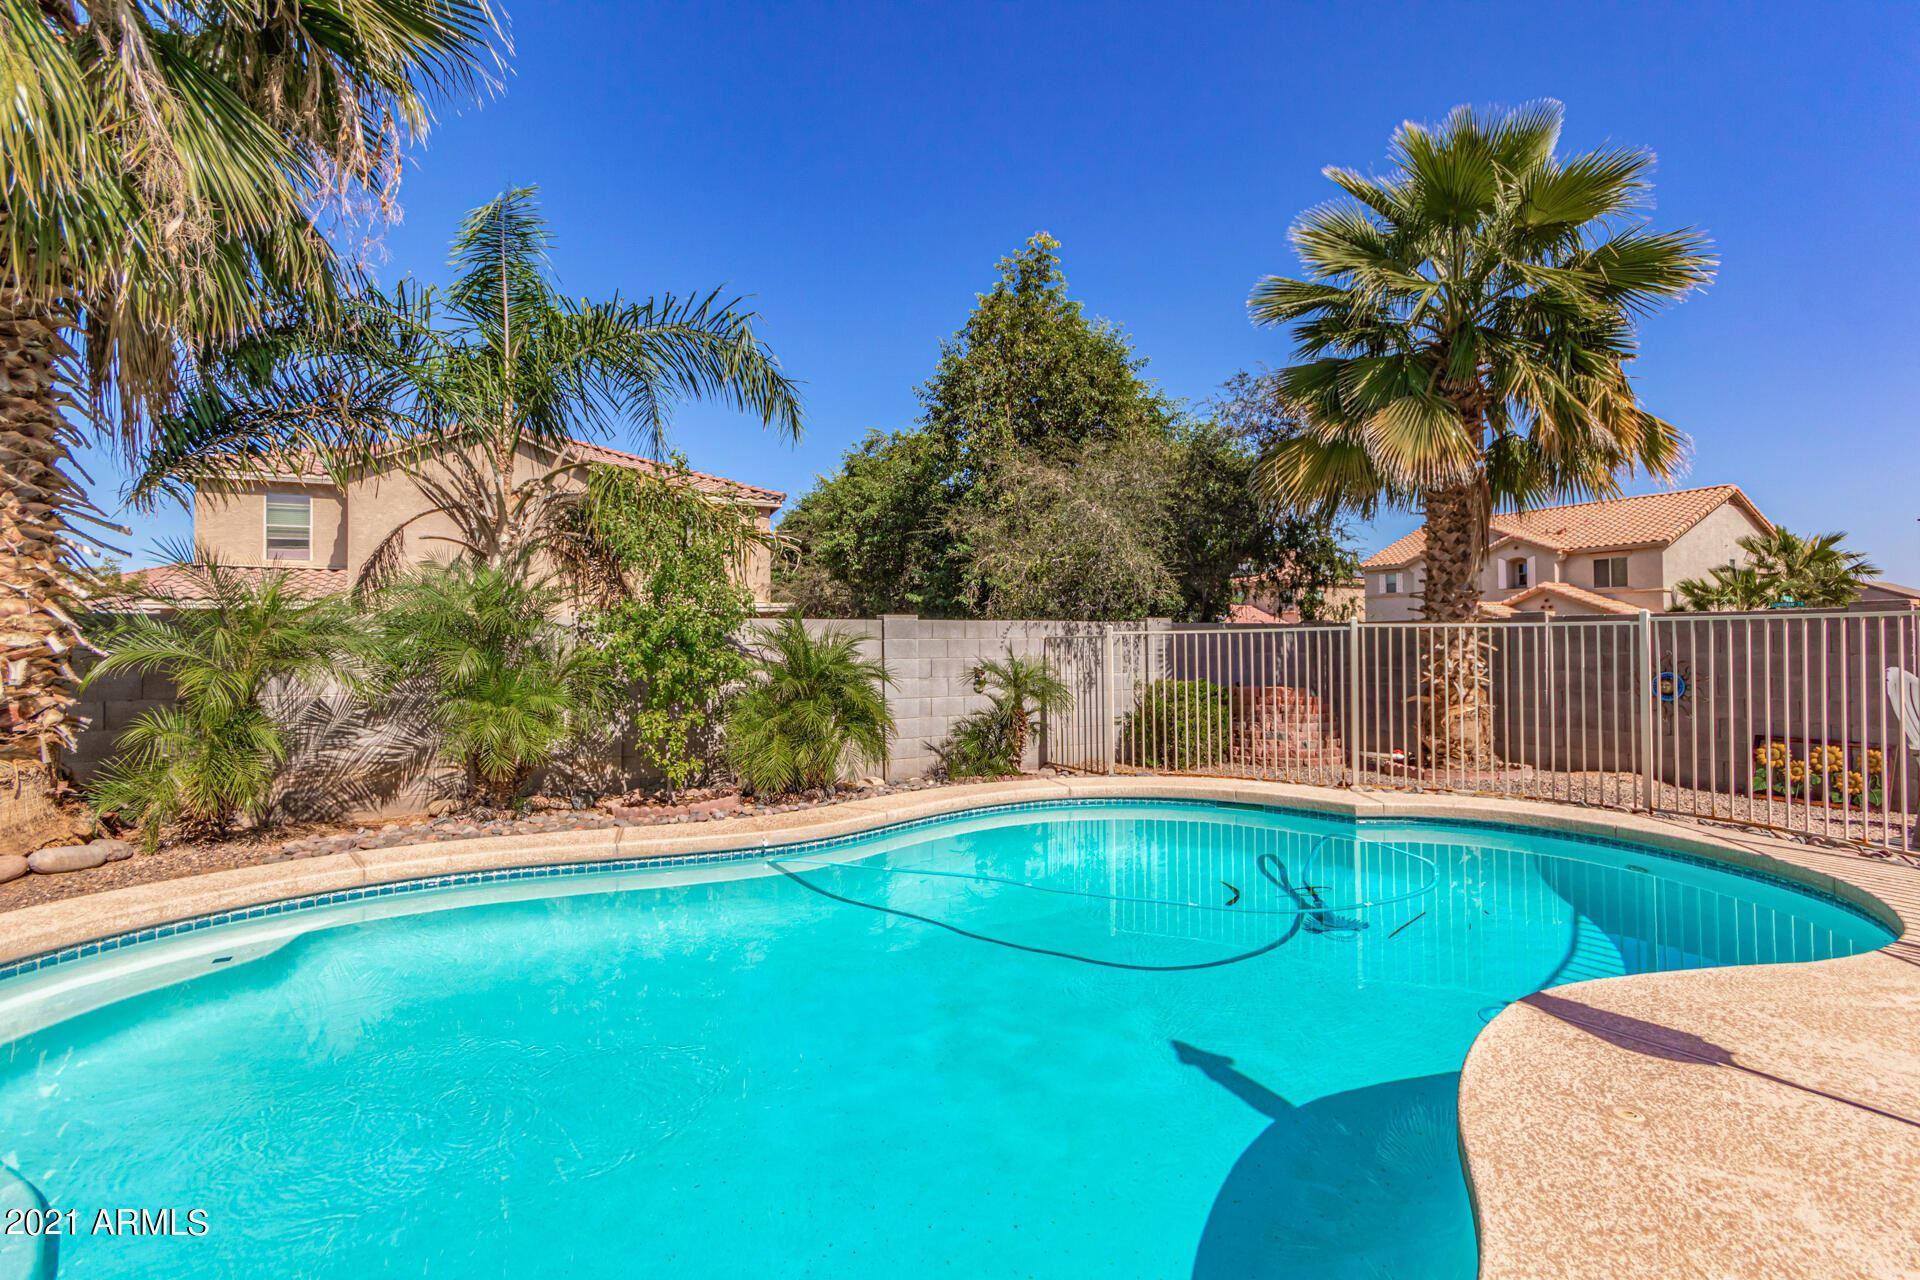 Photo of 2724 W SUNSHINE BUTTE Drive, Queen Creek, AZ 85142 (MLS # 6307527)